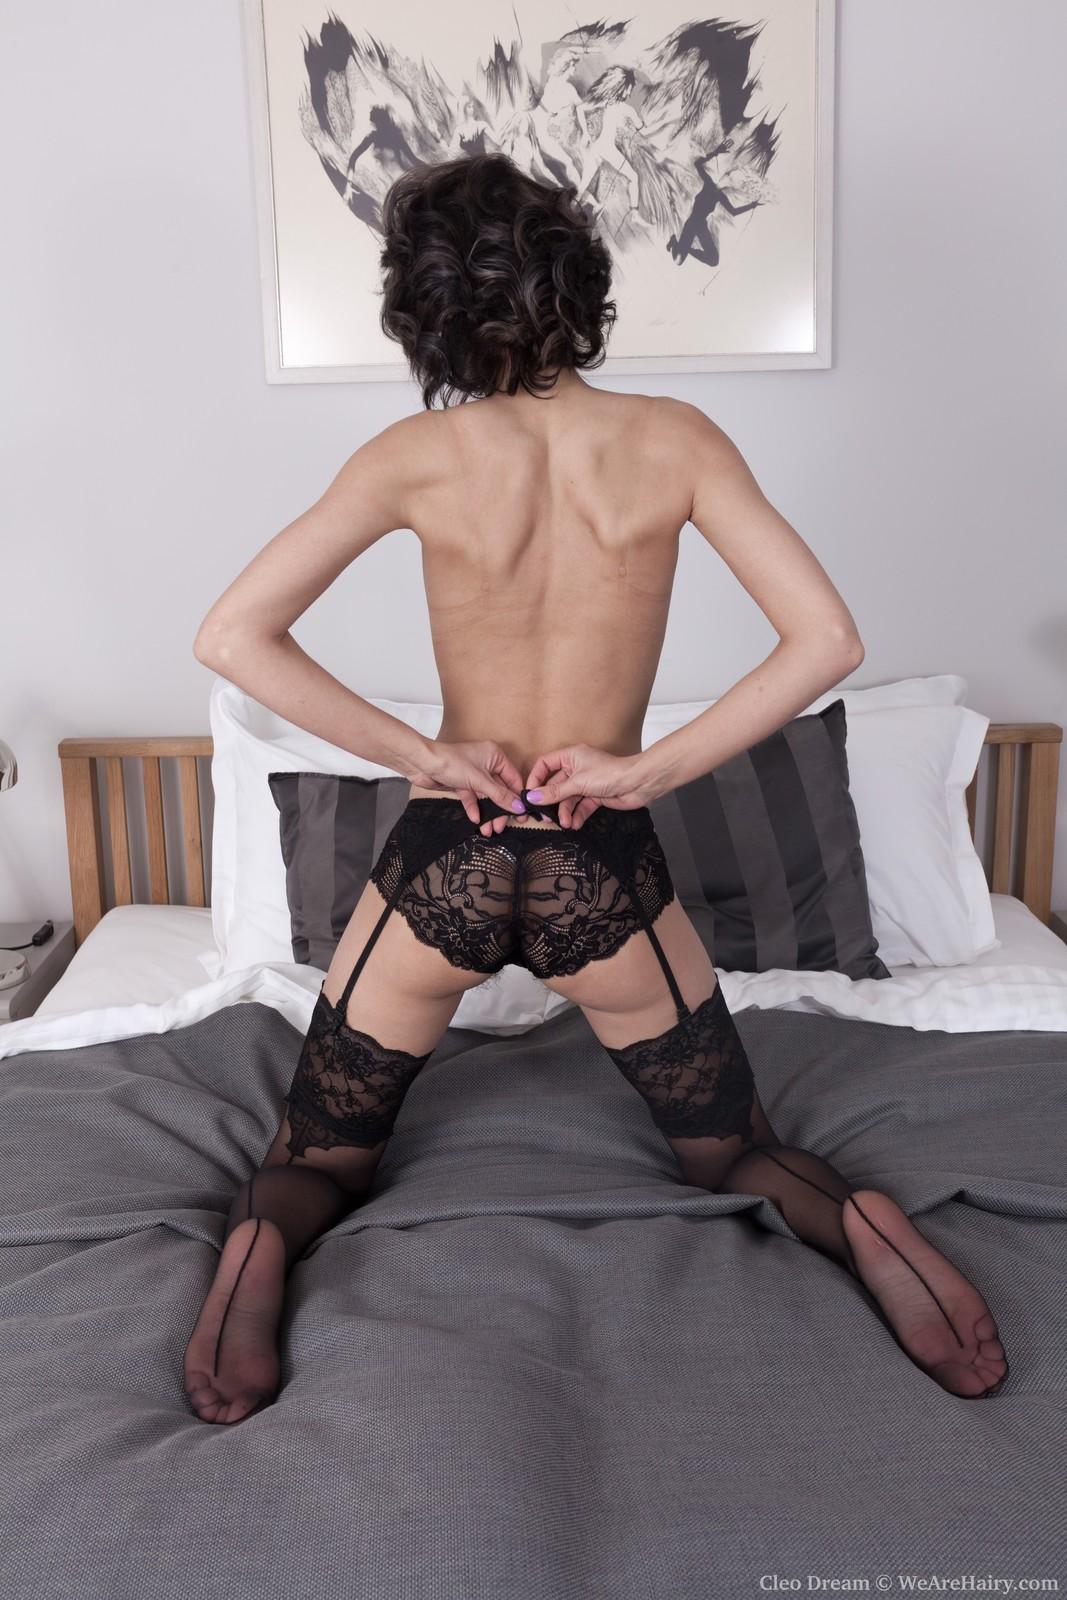 cleo-dream-slides-off-her-black-lingerie-in-bed4.jpg